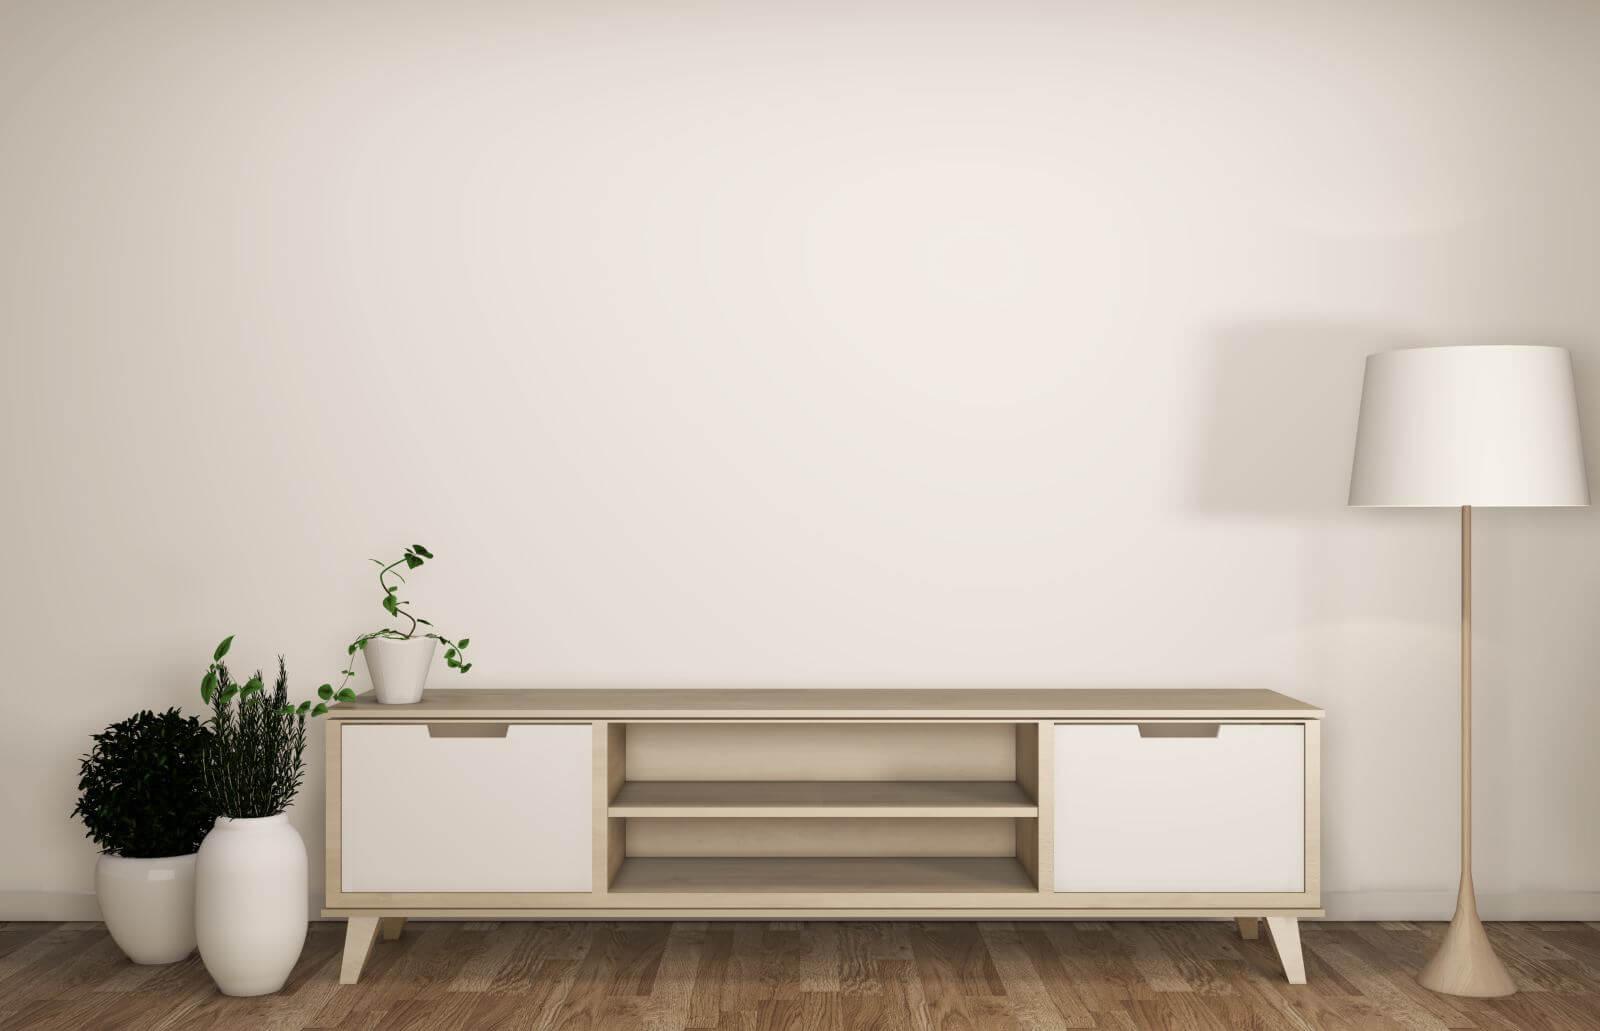 cabinet in modern empty room Japanese - zen style,minimal designs. 3D rendering